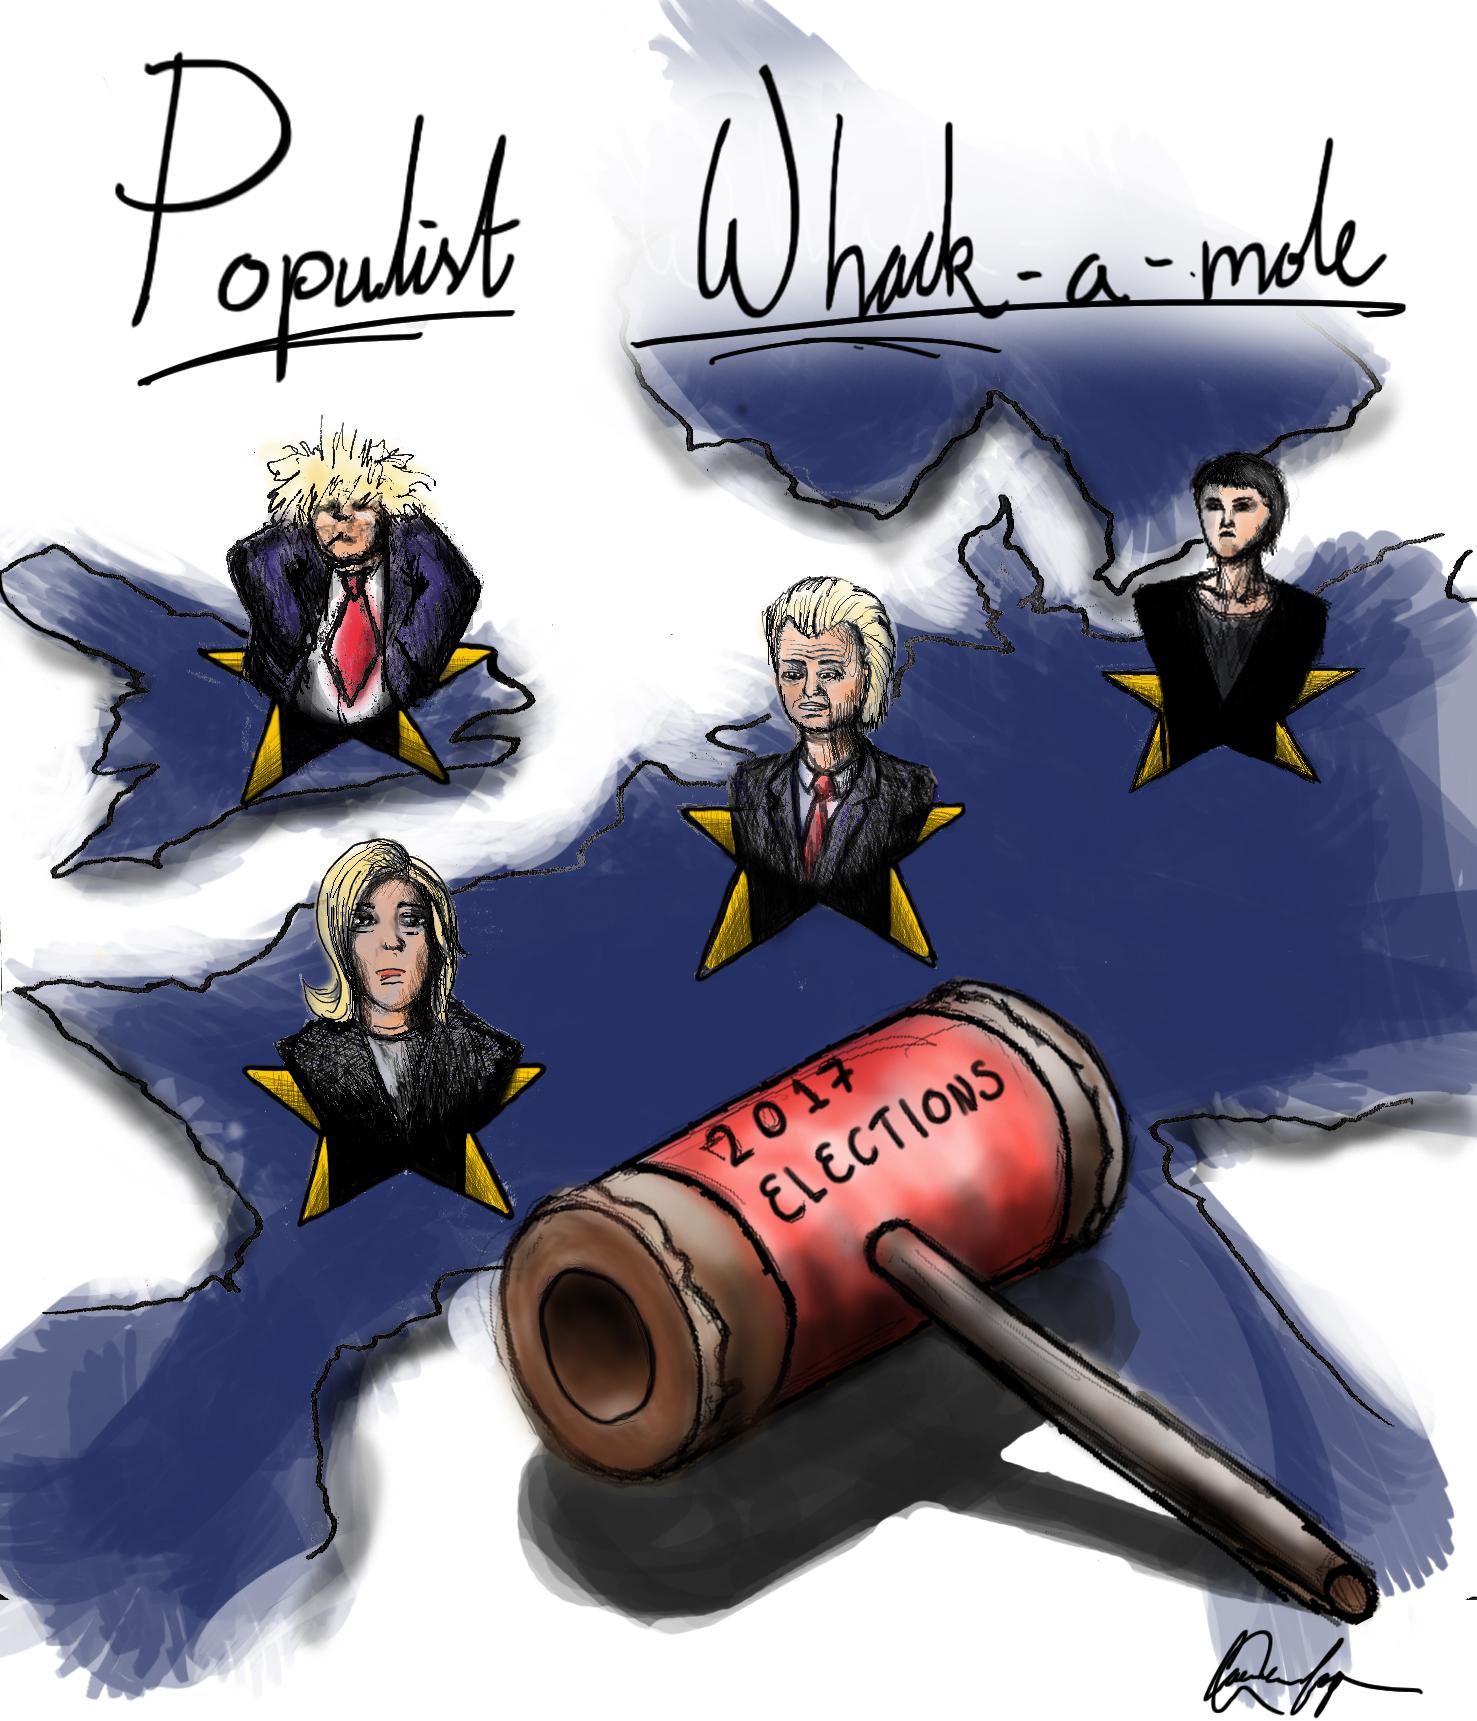 Populist Whack-a-Mole     Eirôn      by Coen-Reinier Lap